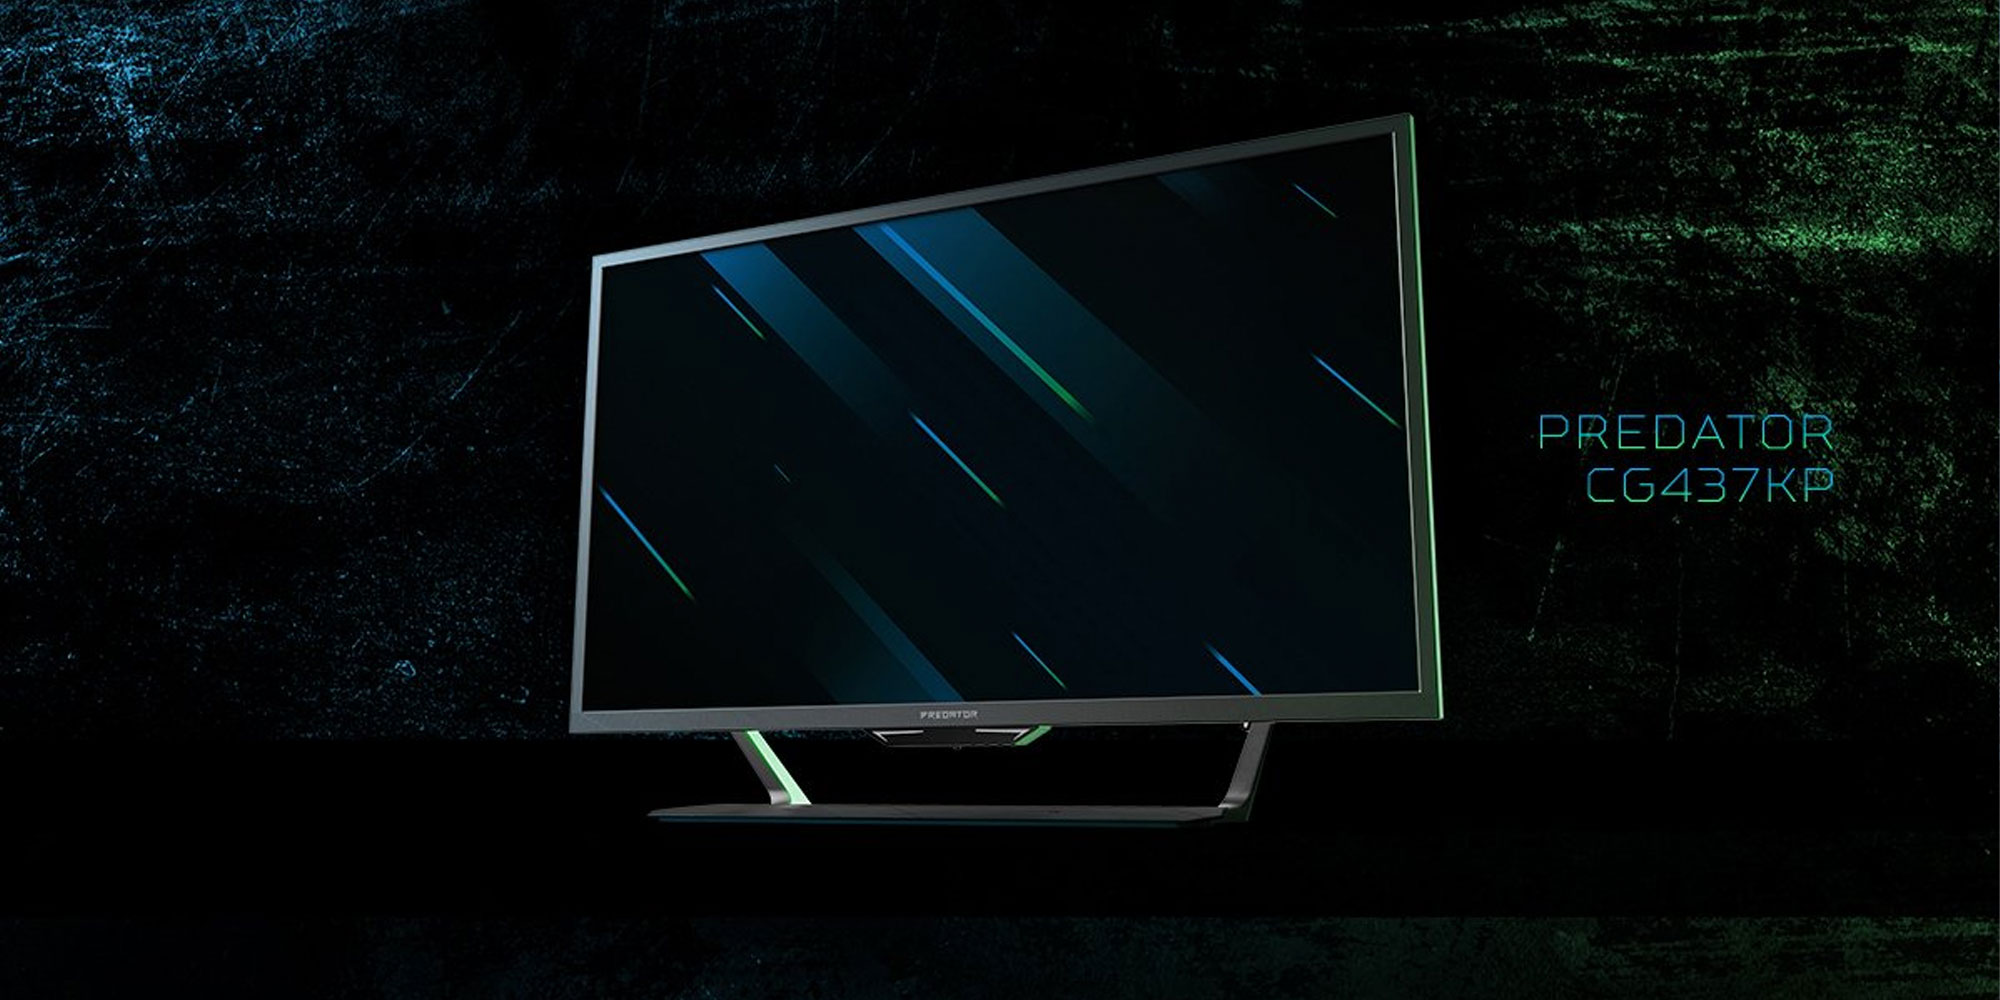 Acer Predator CG437K P 43-inch Gaming Monitor